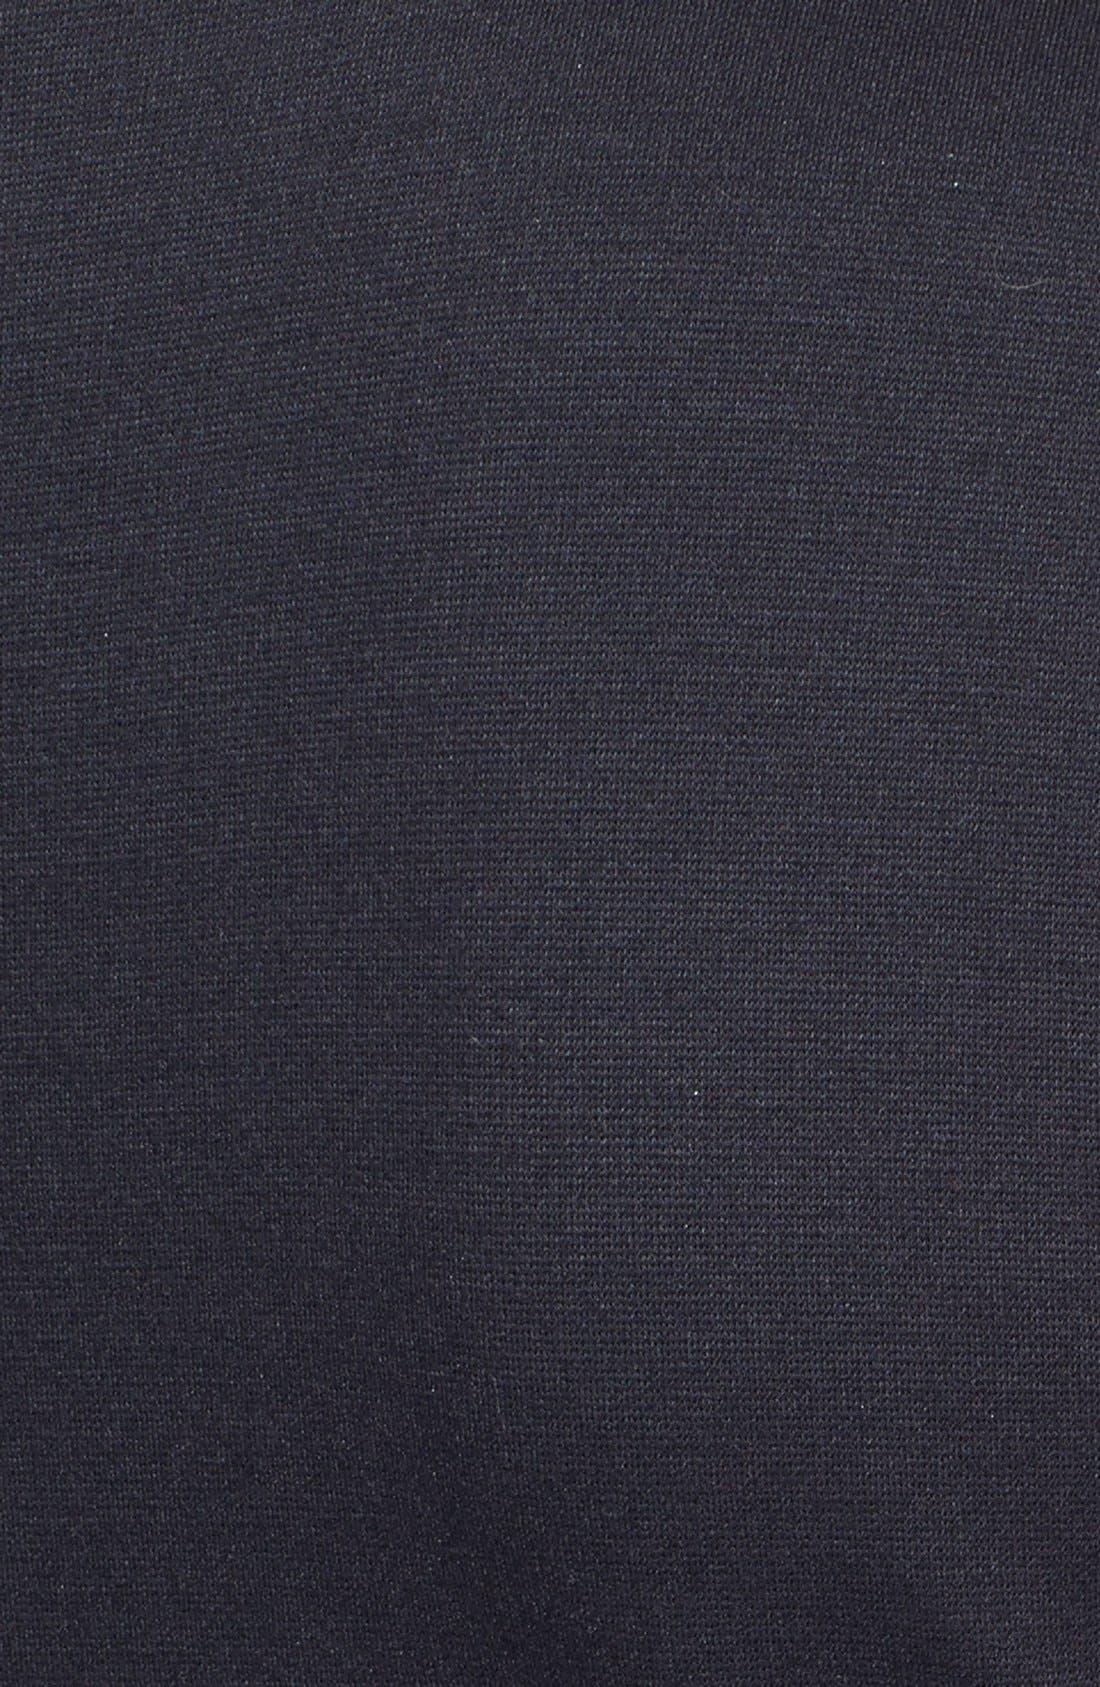 Alternate Image 3  - MICHAEL Michael Kors Oval Grommet Sheath Dress